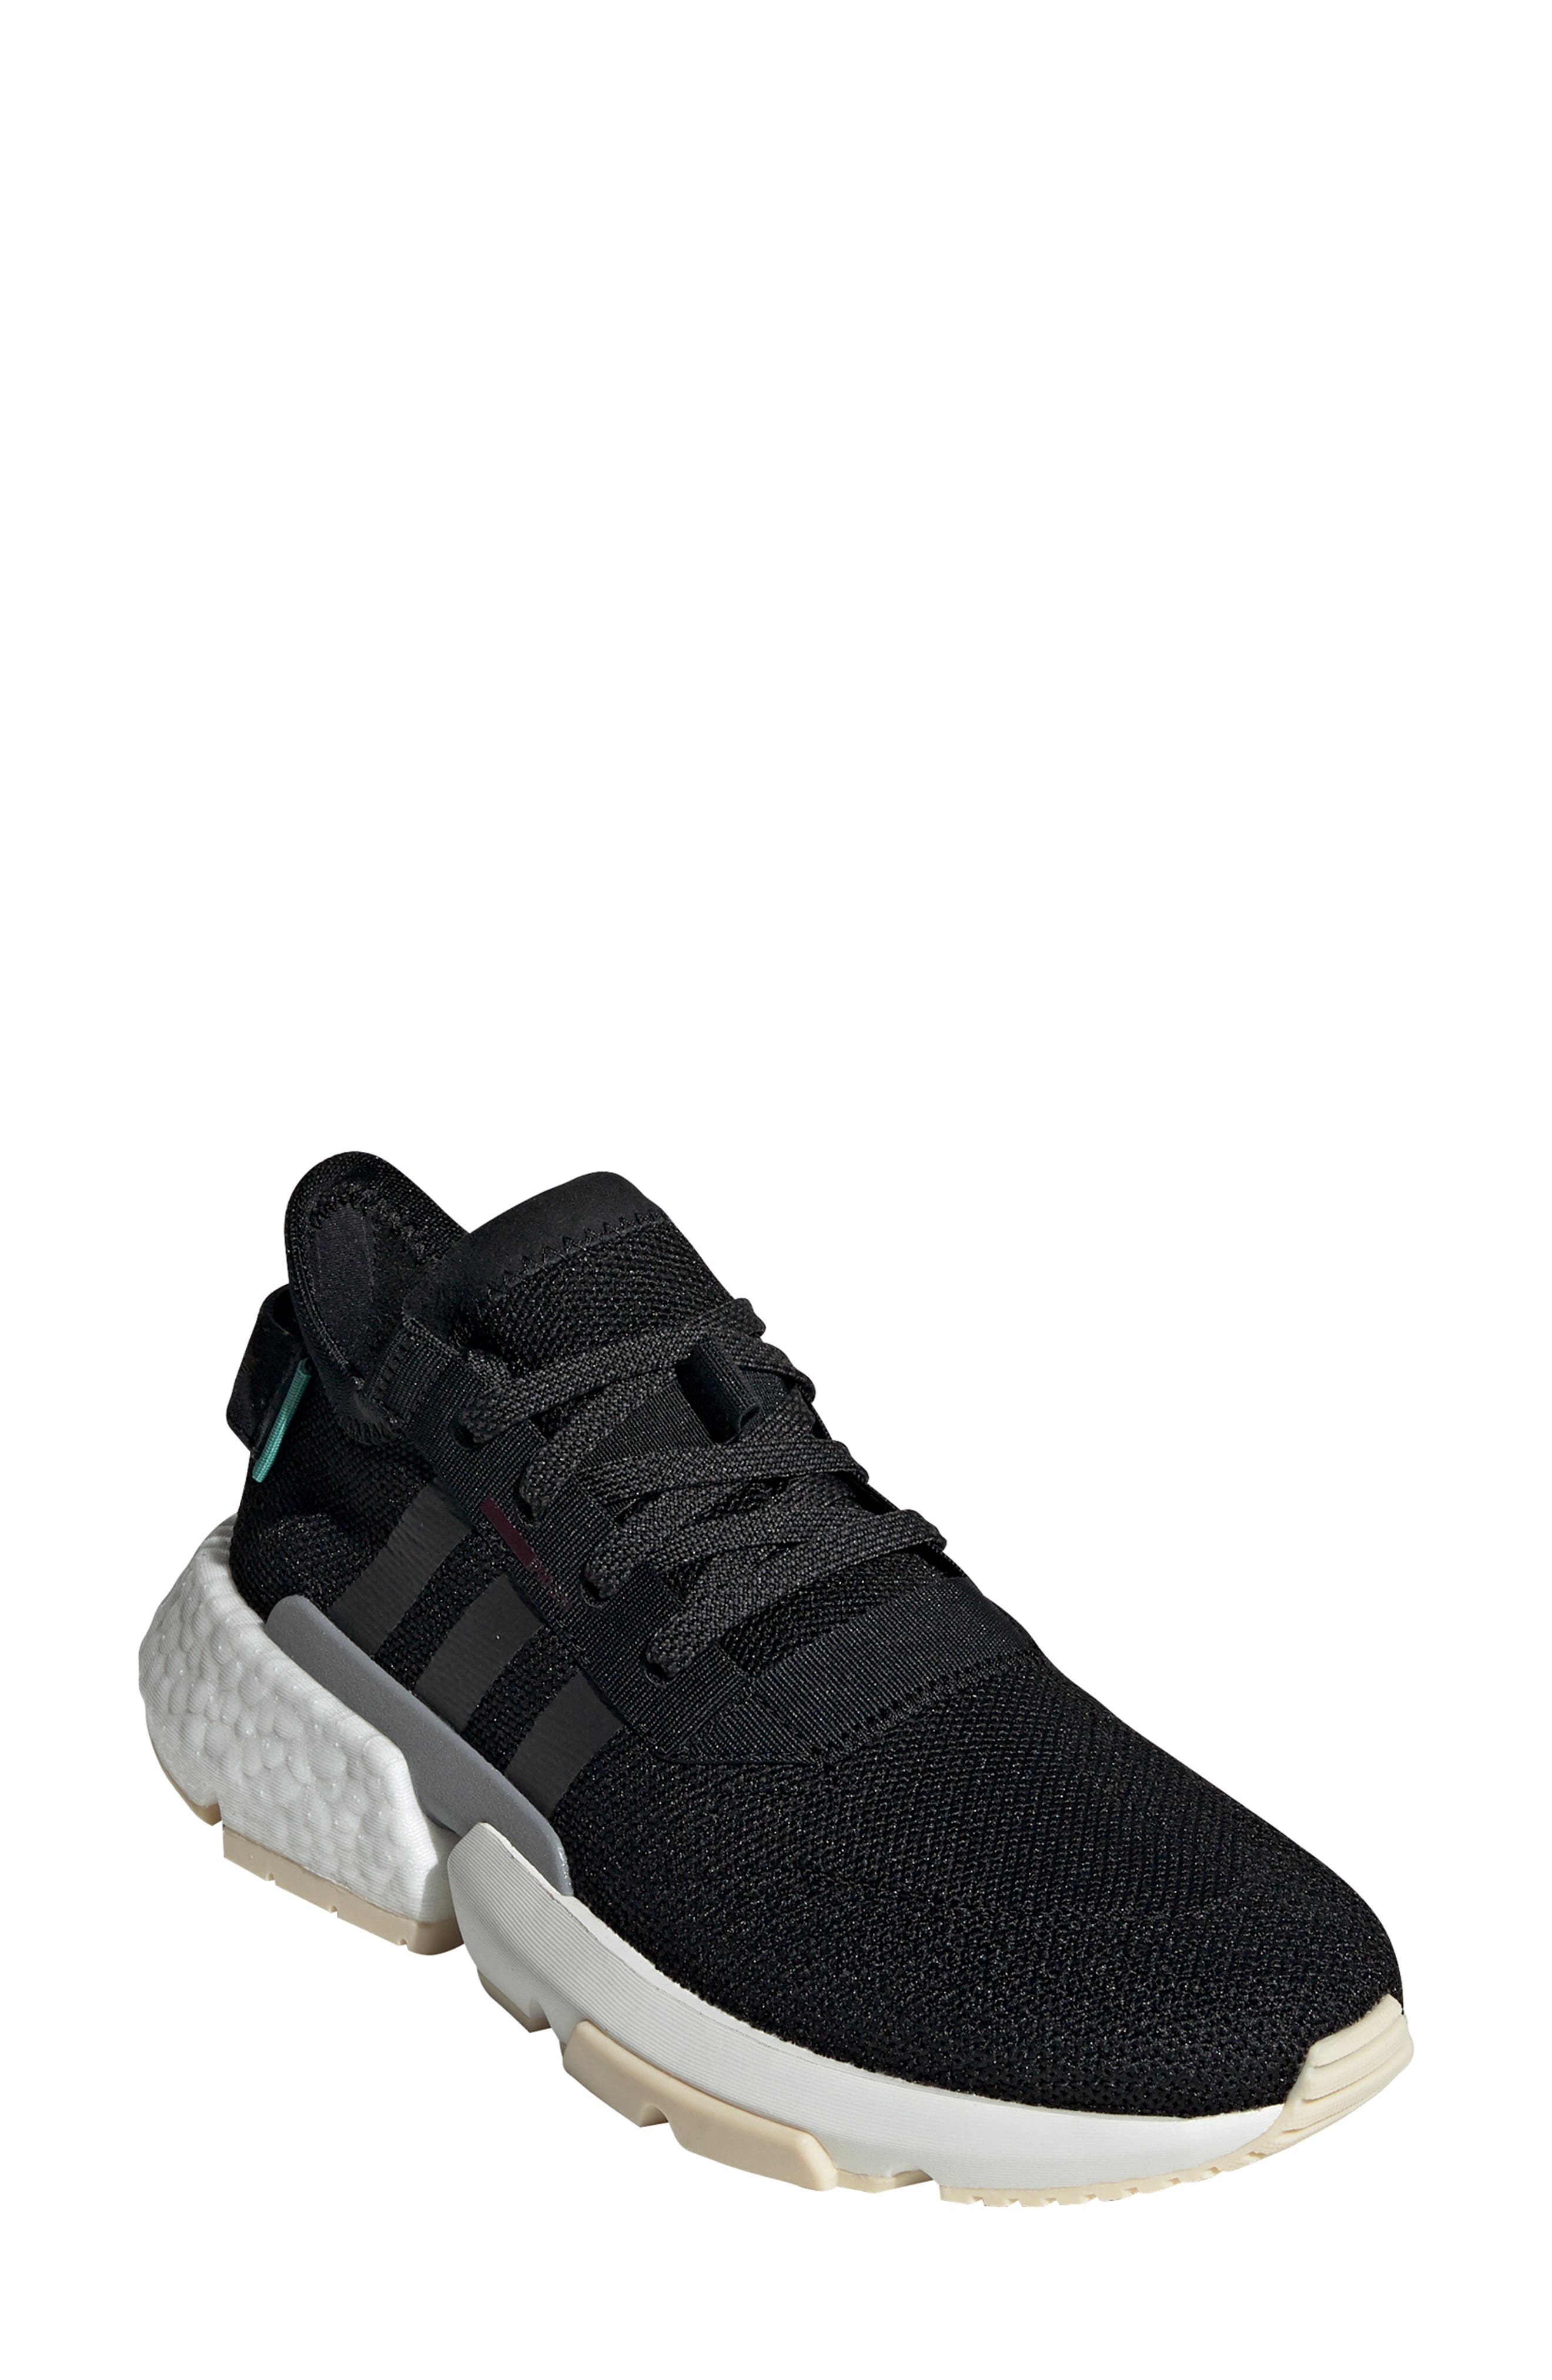 6dc33a96ec982 adidas boost